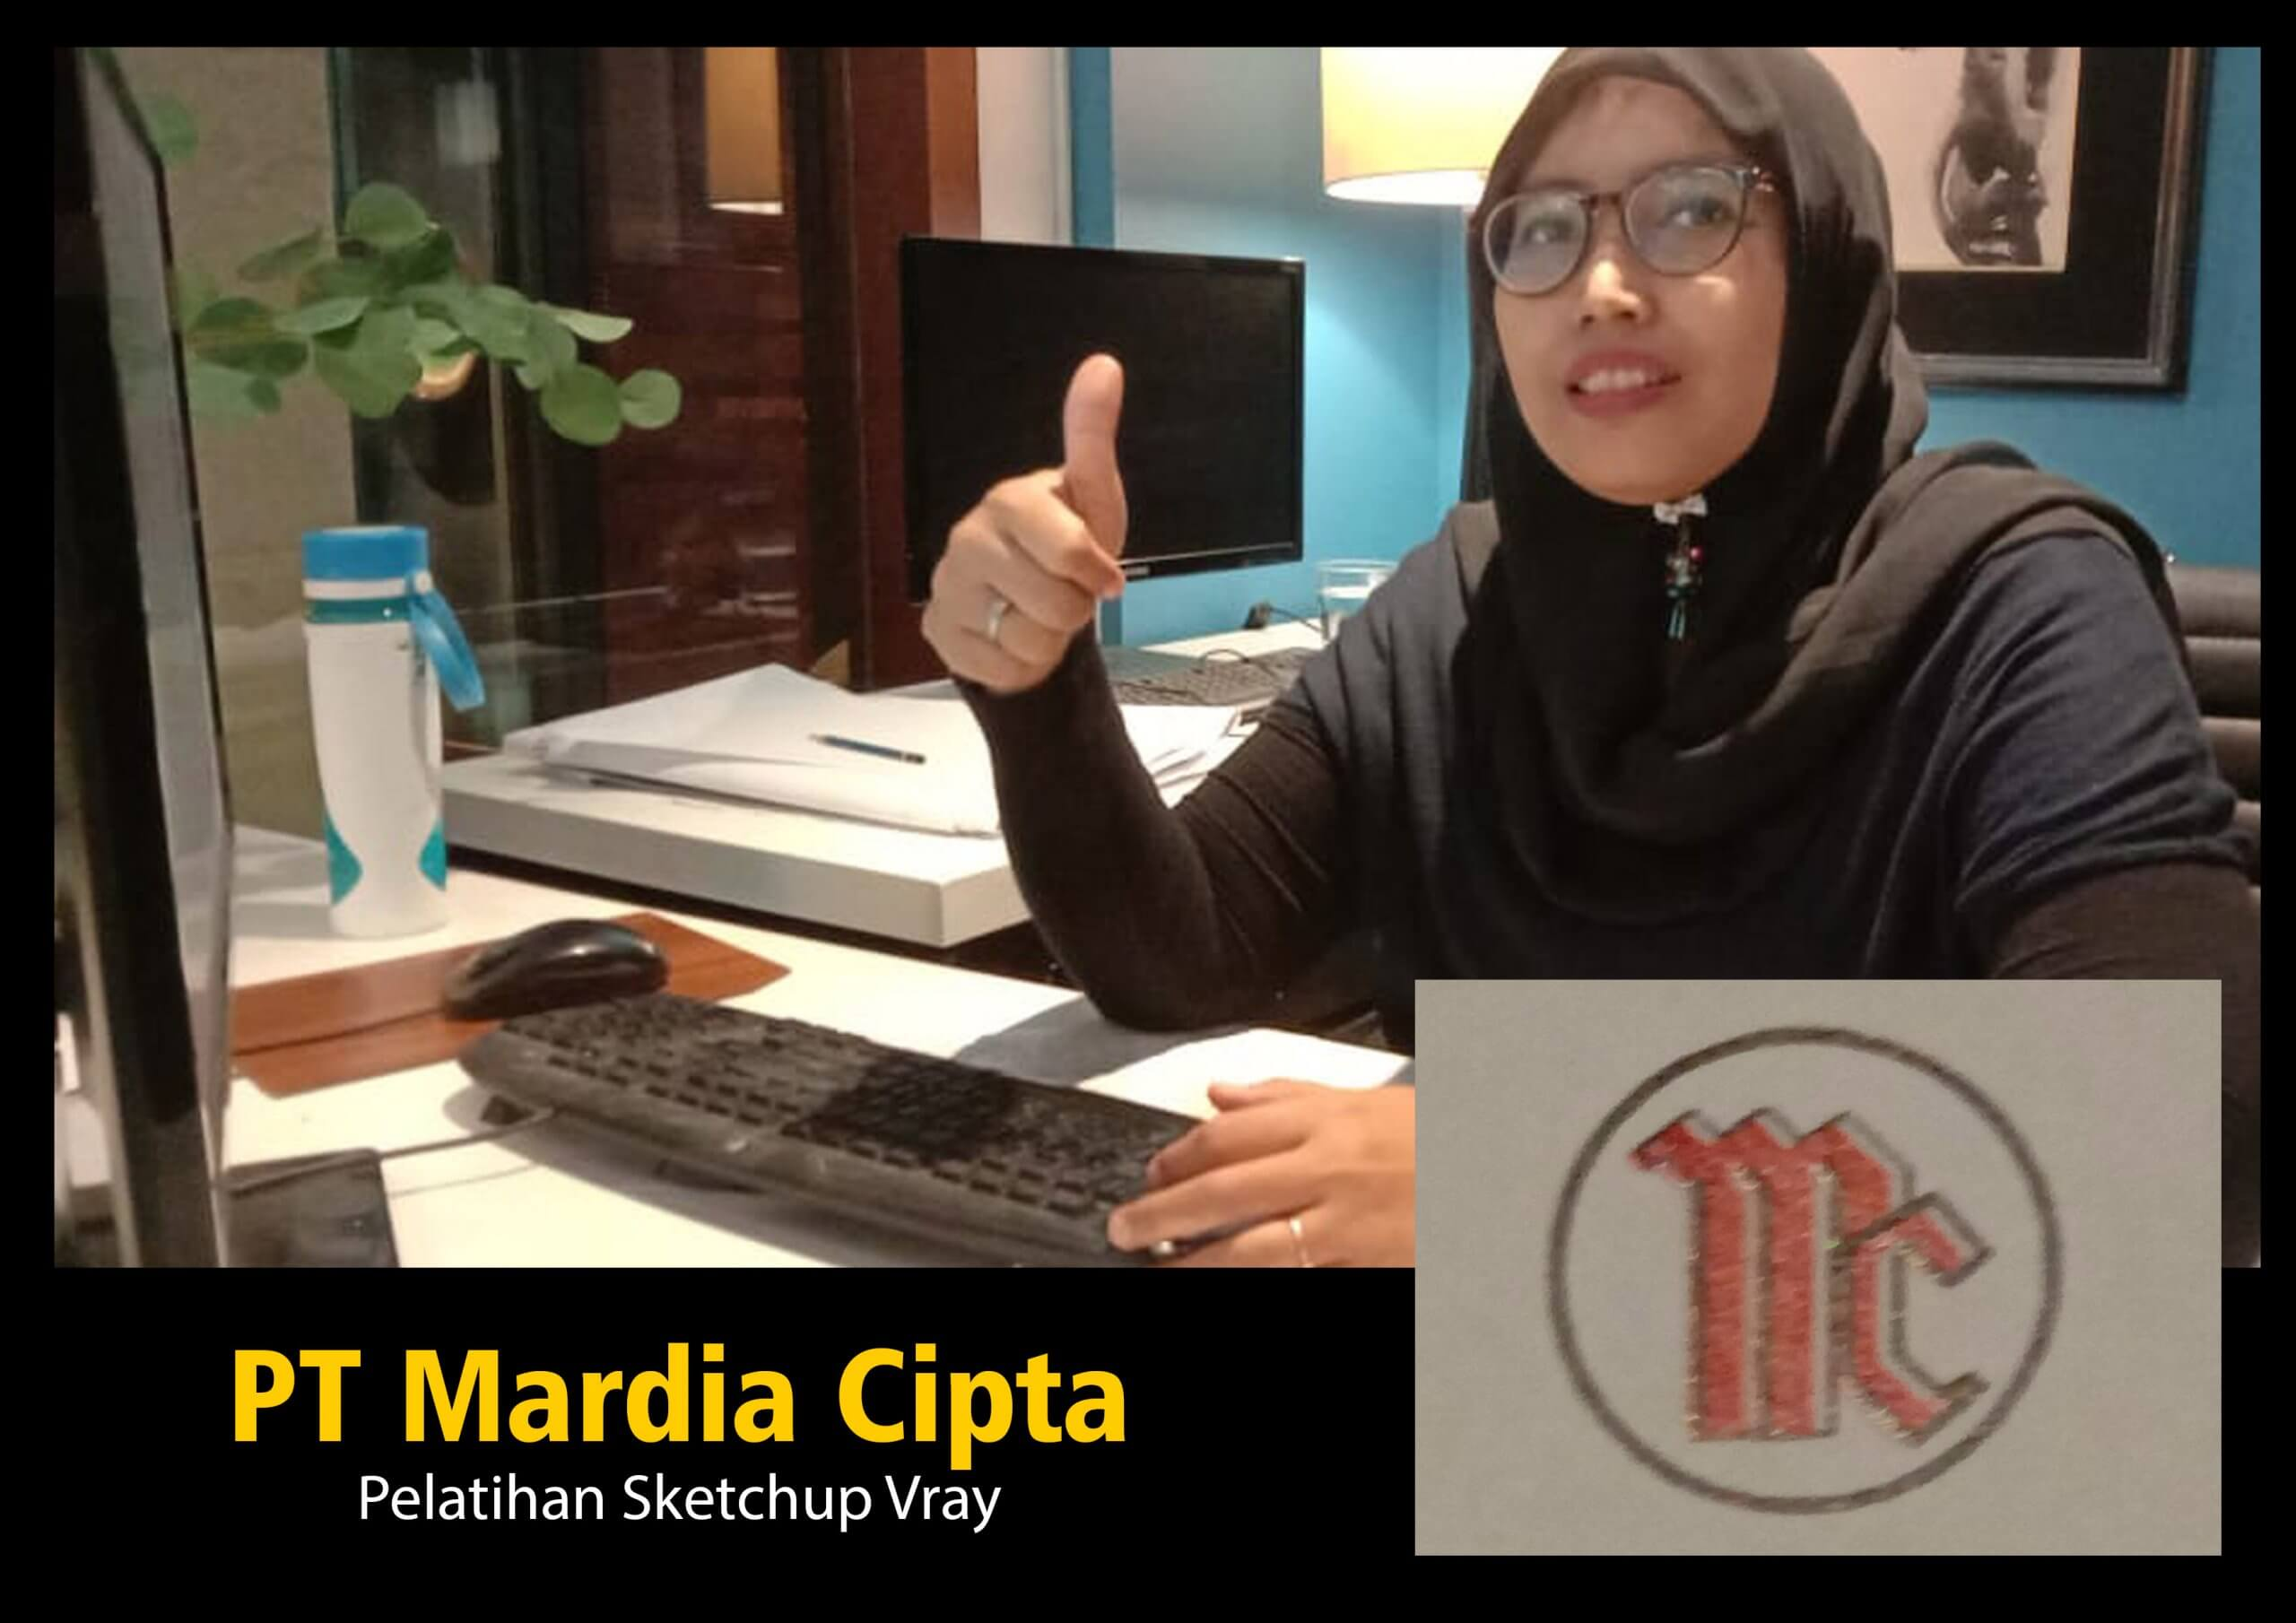 PIGORA MARDIA CIPTA